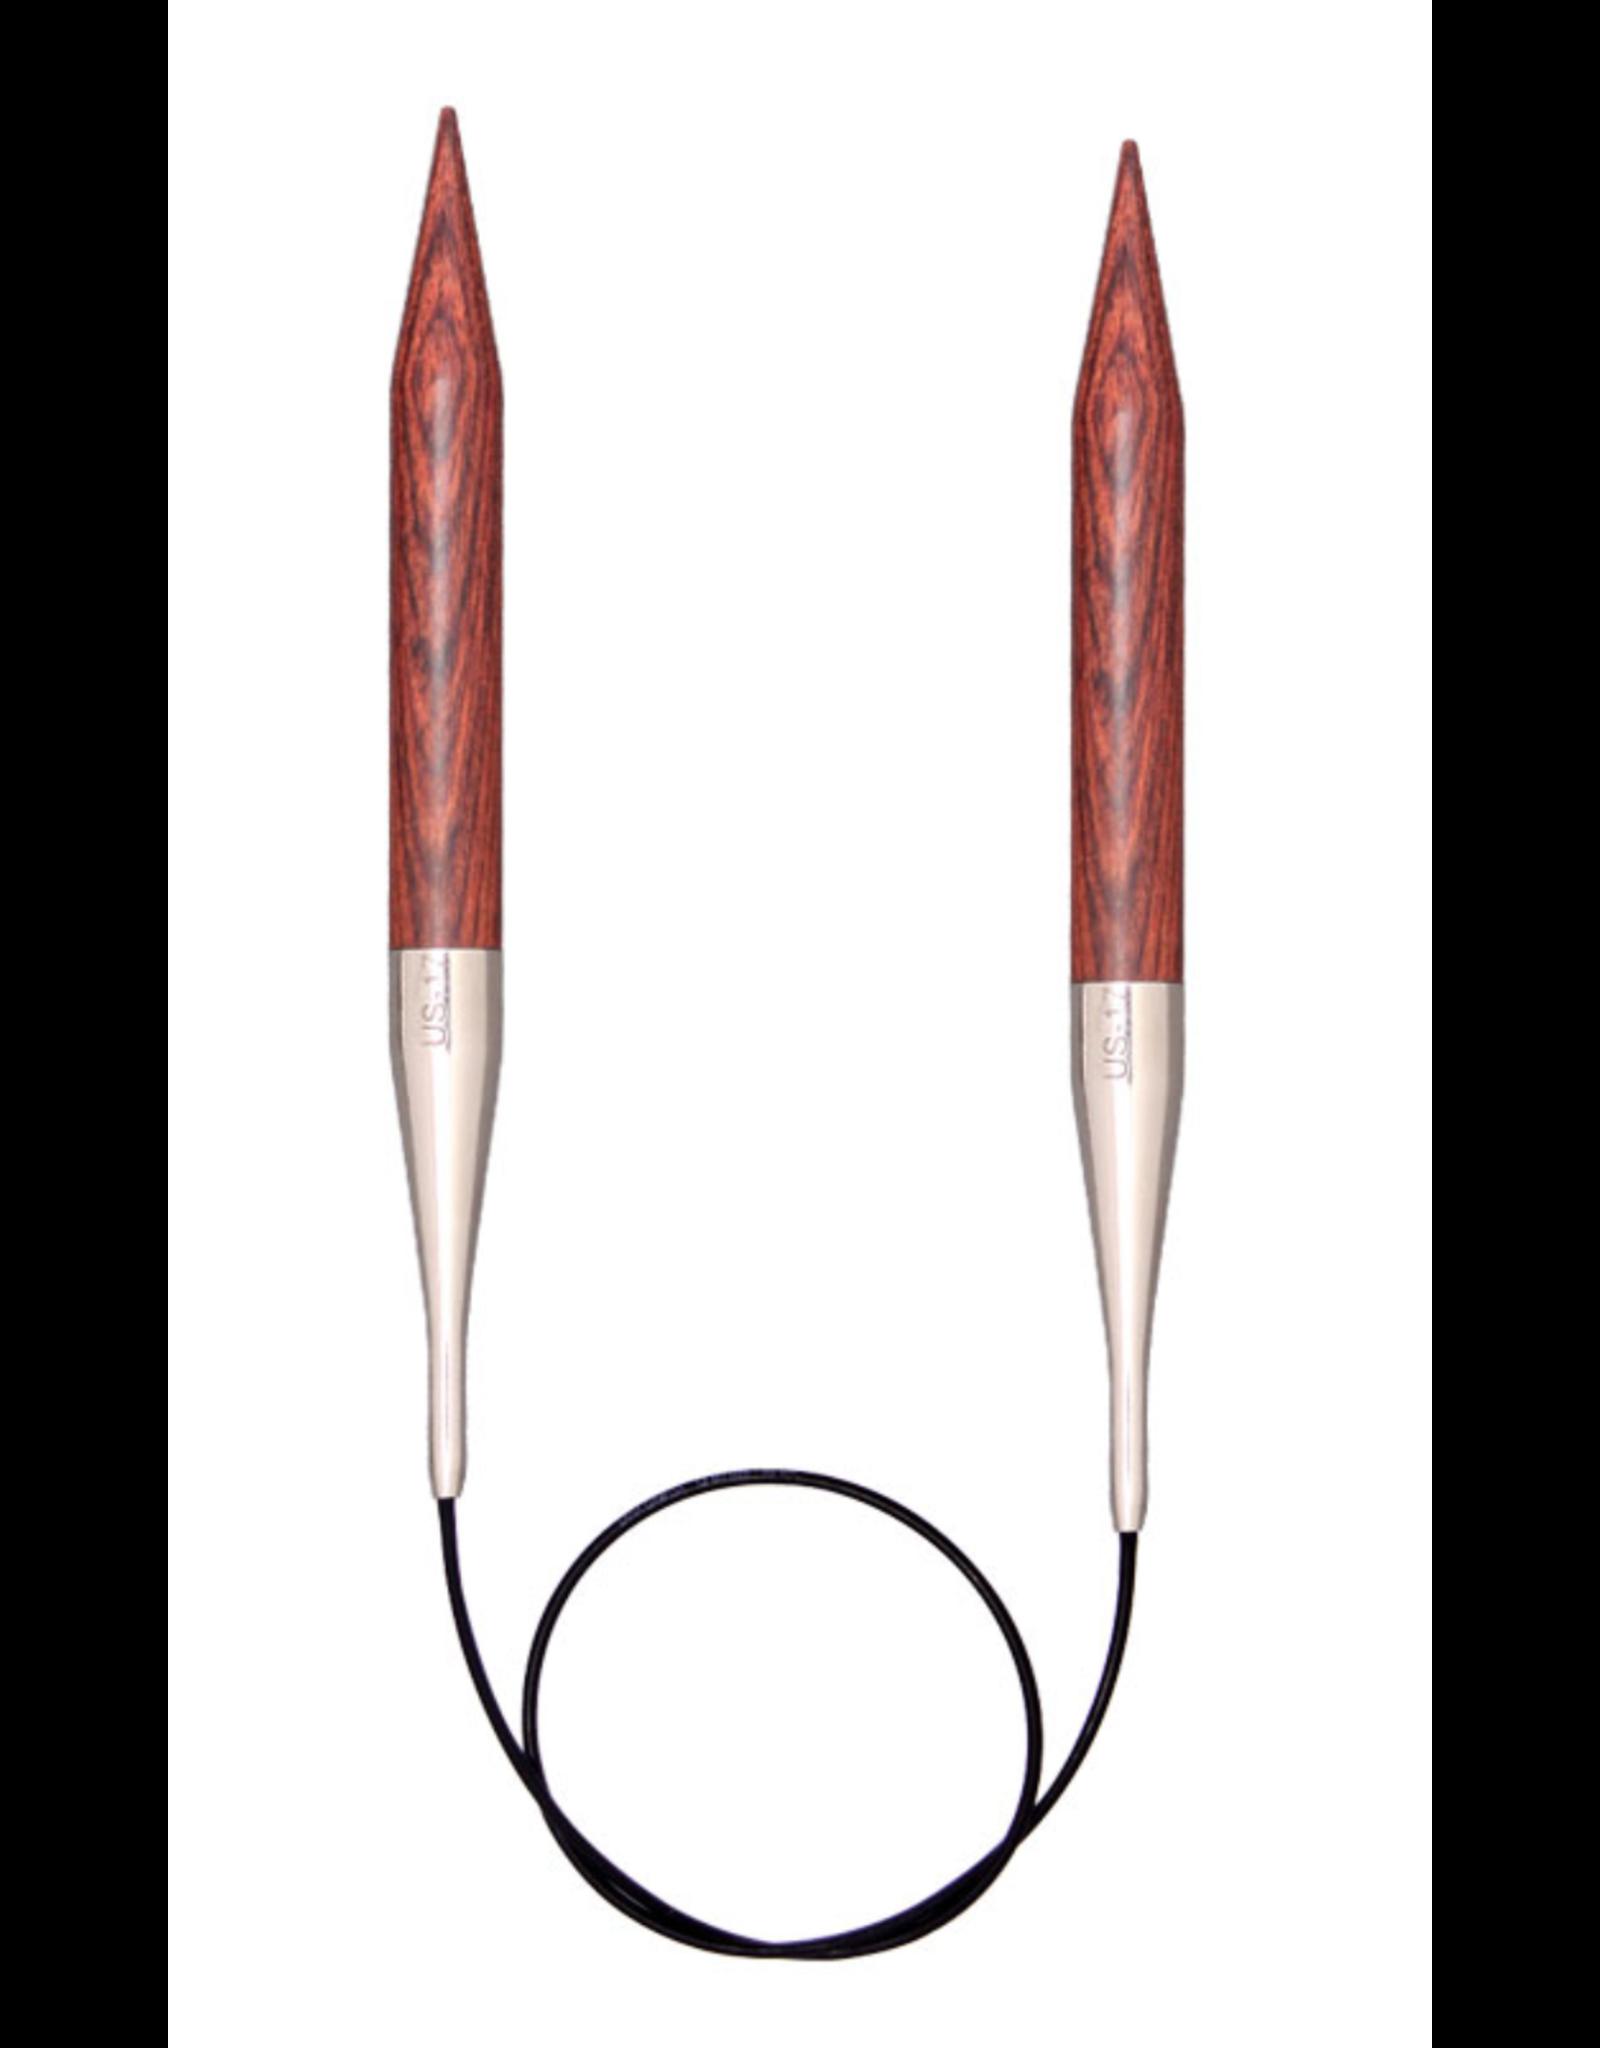 "Dreamz 24"" long circular needle size US 17"